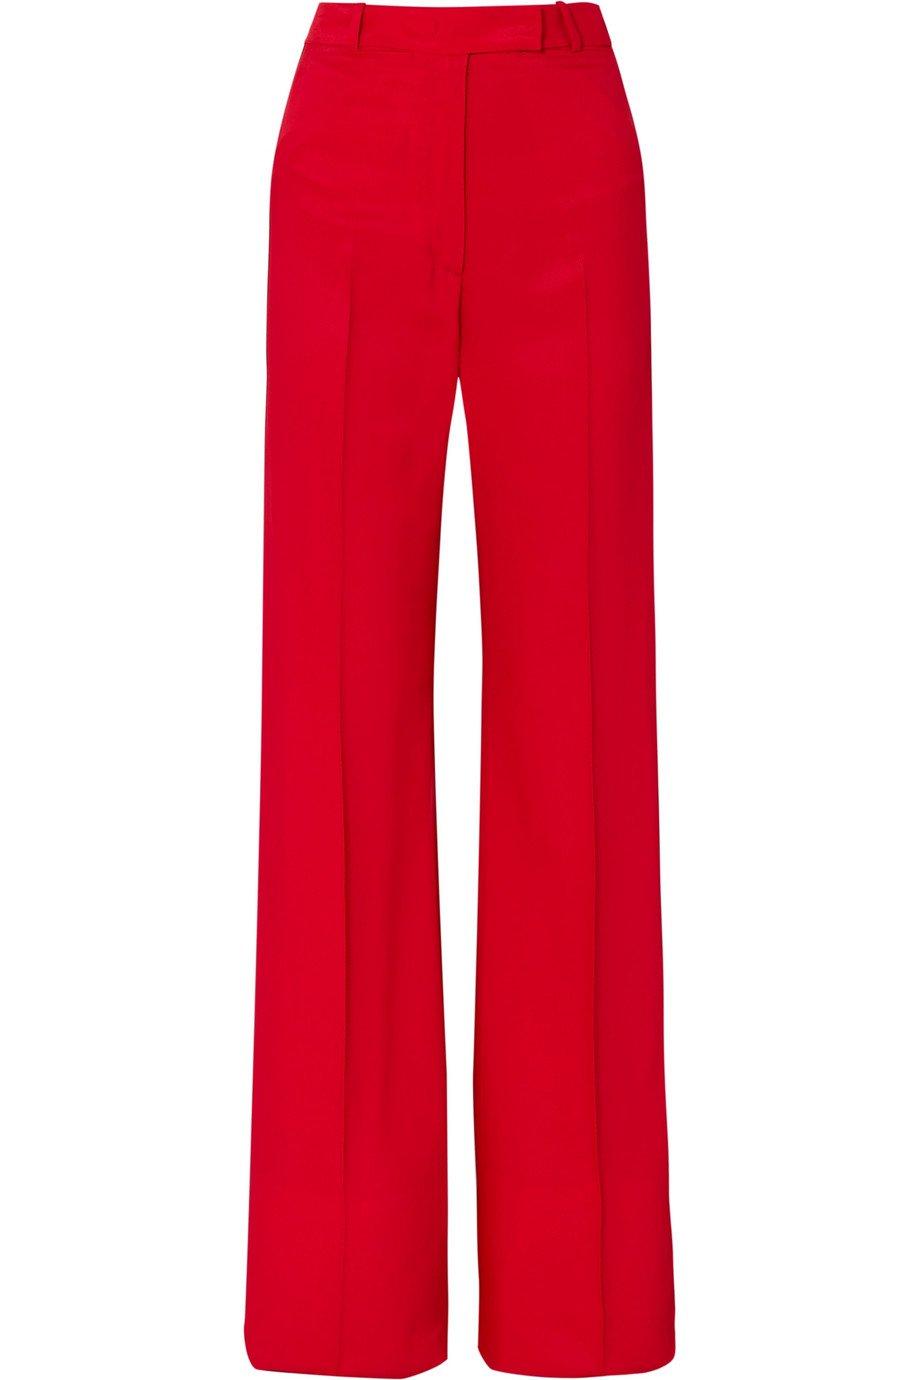 Golden Goose Deluxe Brand   Carrie drill wide-leg pants   NET-A-PORTER.COM